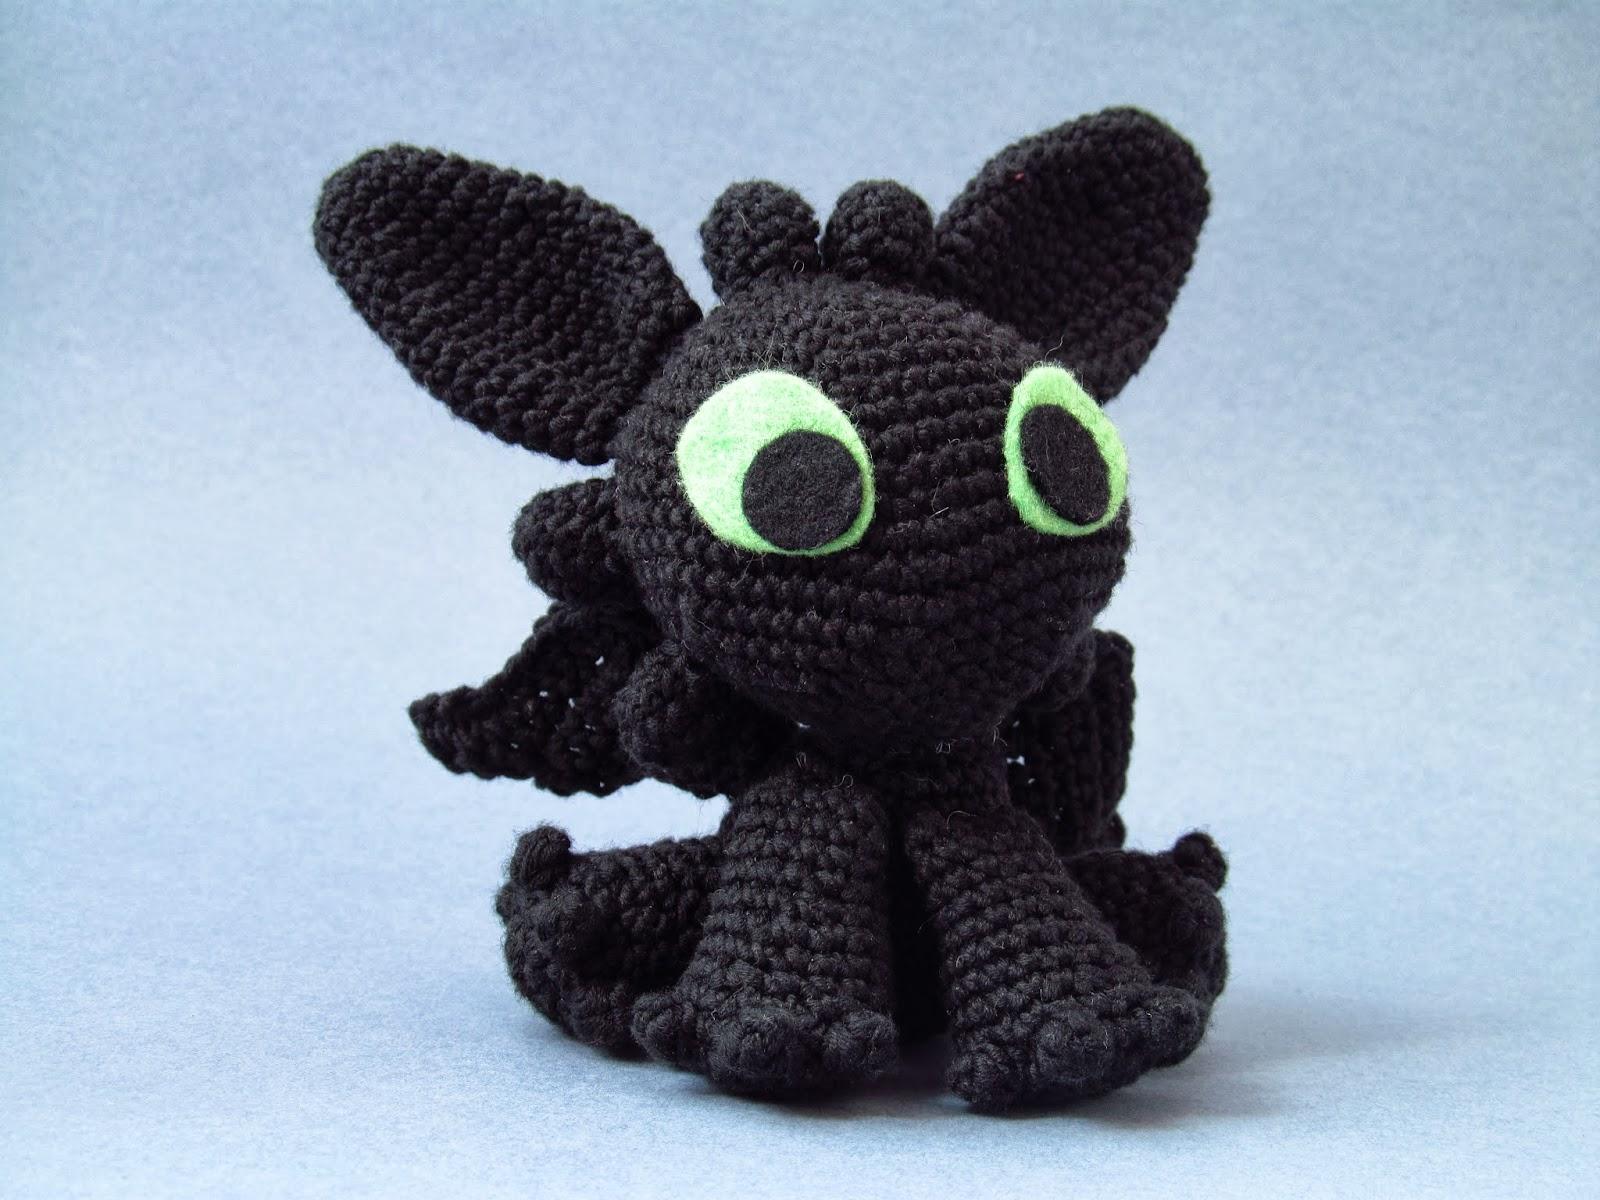 Toothless - Cómo entrenar a tu dragón   Tezukuri